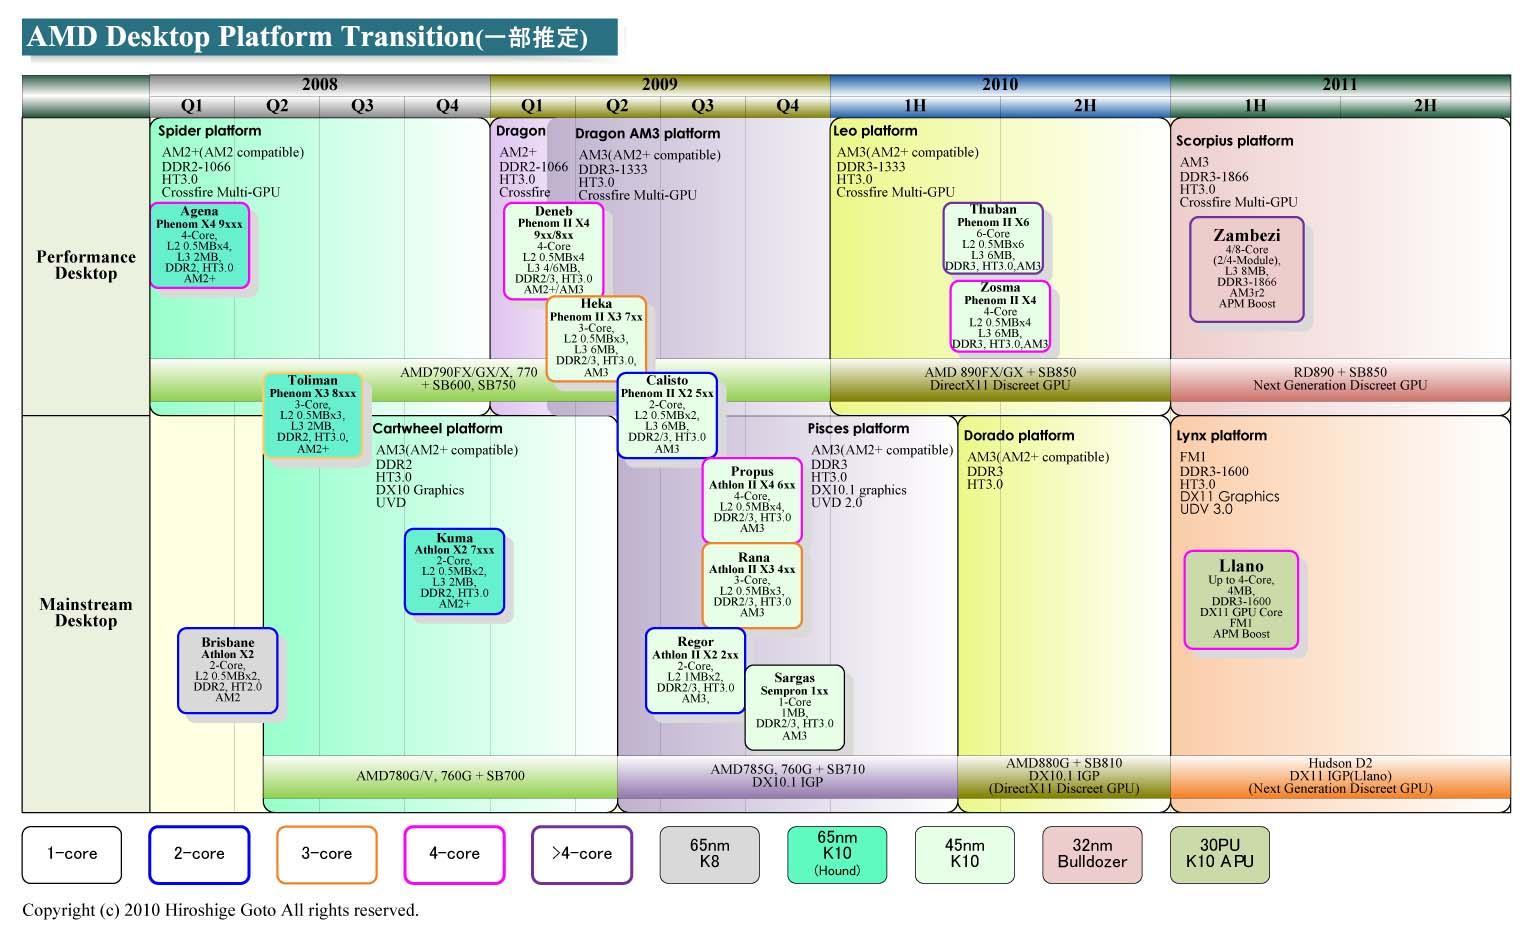 "AMDデスクトップCPU移行図<br>PDF版は<a ipw_linktype=""filelink_raw"" ipw_id=""679151"" href=""/video/pcw/docs/364/107/p09.pdf"">こちら</a>"